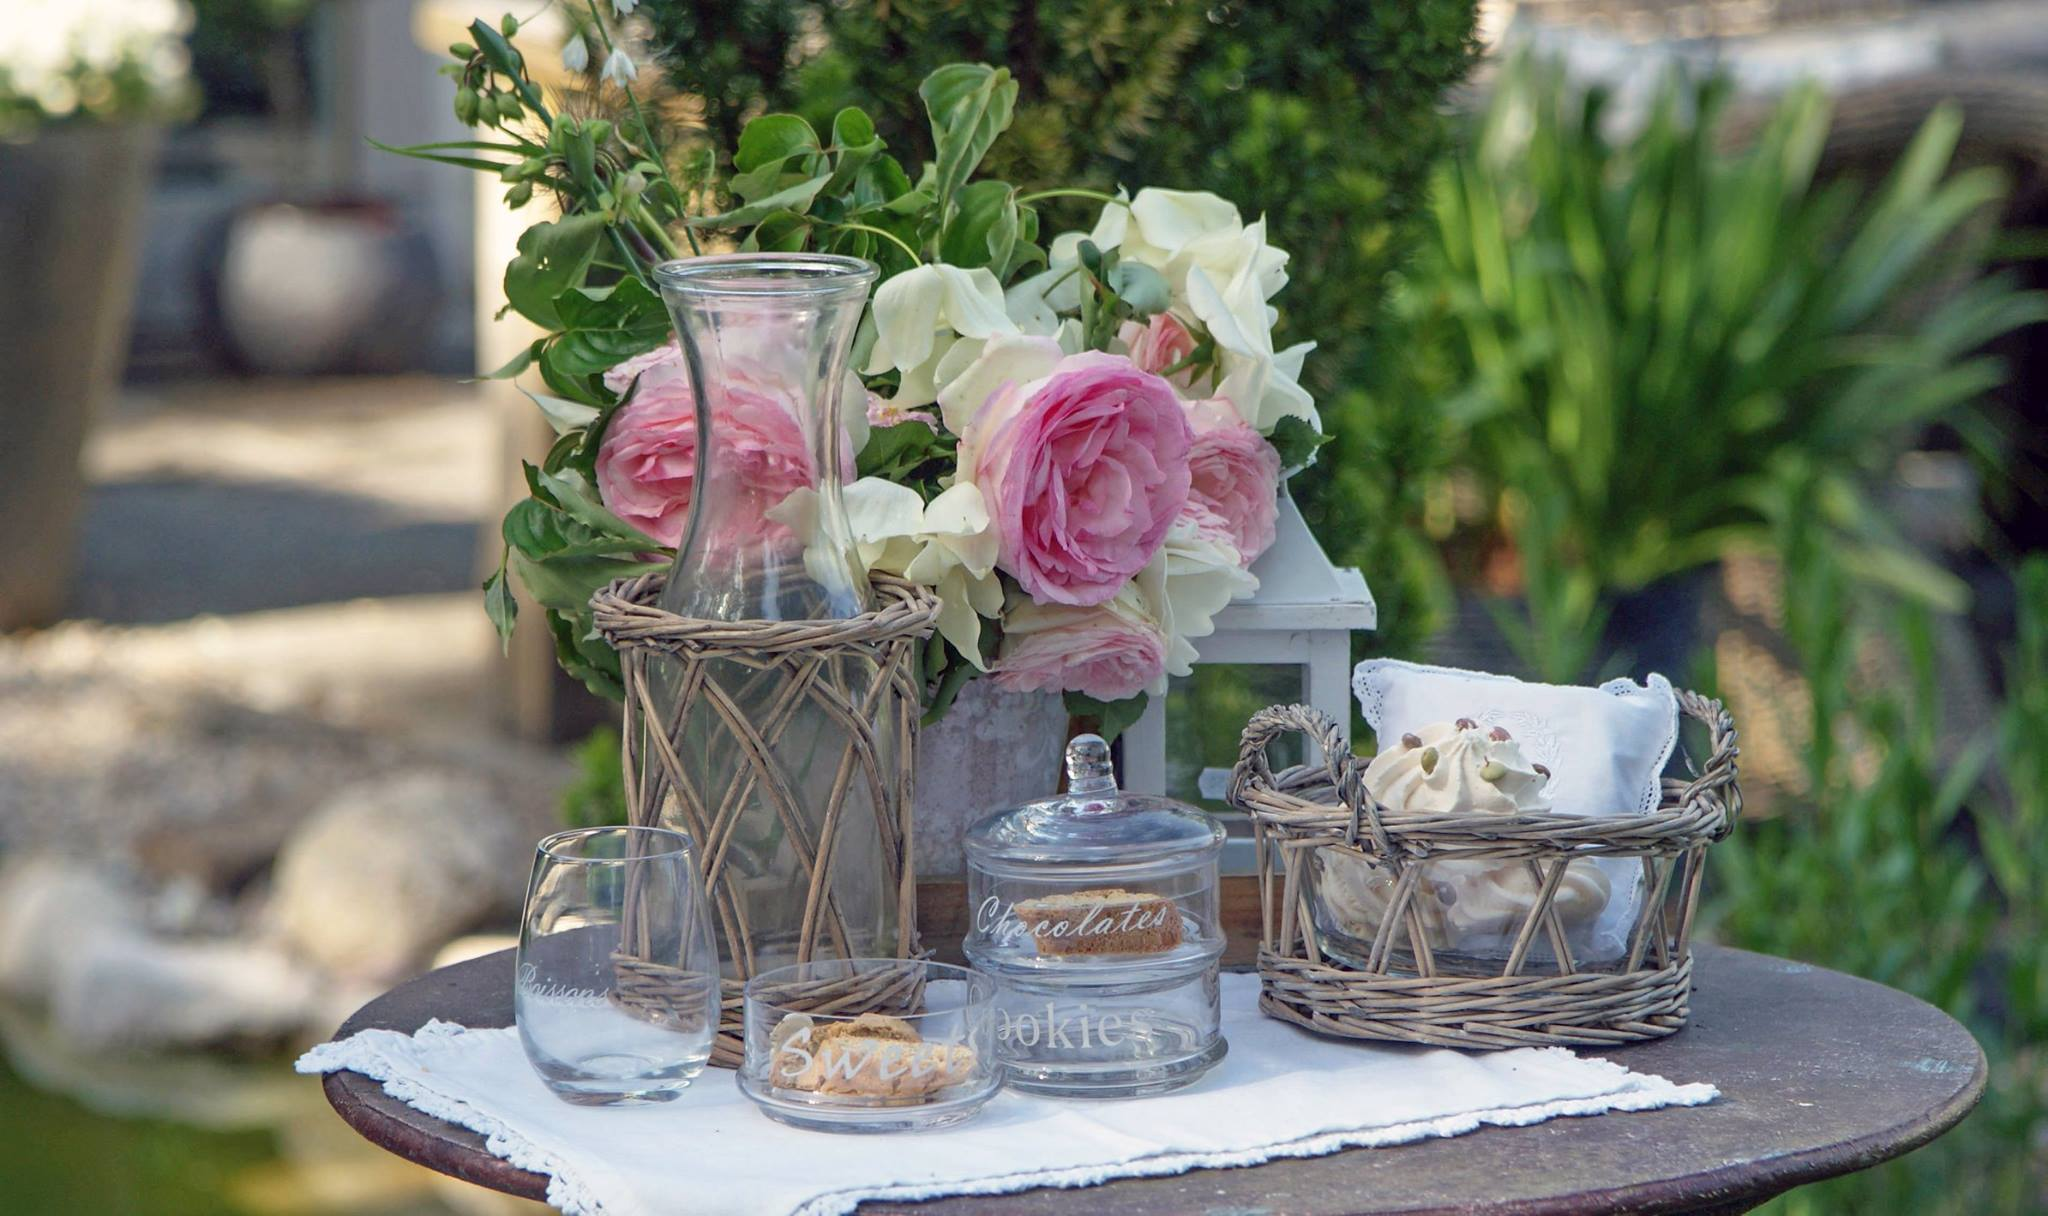 Il giardino boutique di alexandra kaderli mathys shabby - Shabby chic giardino ...